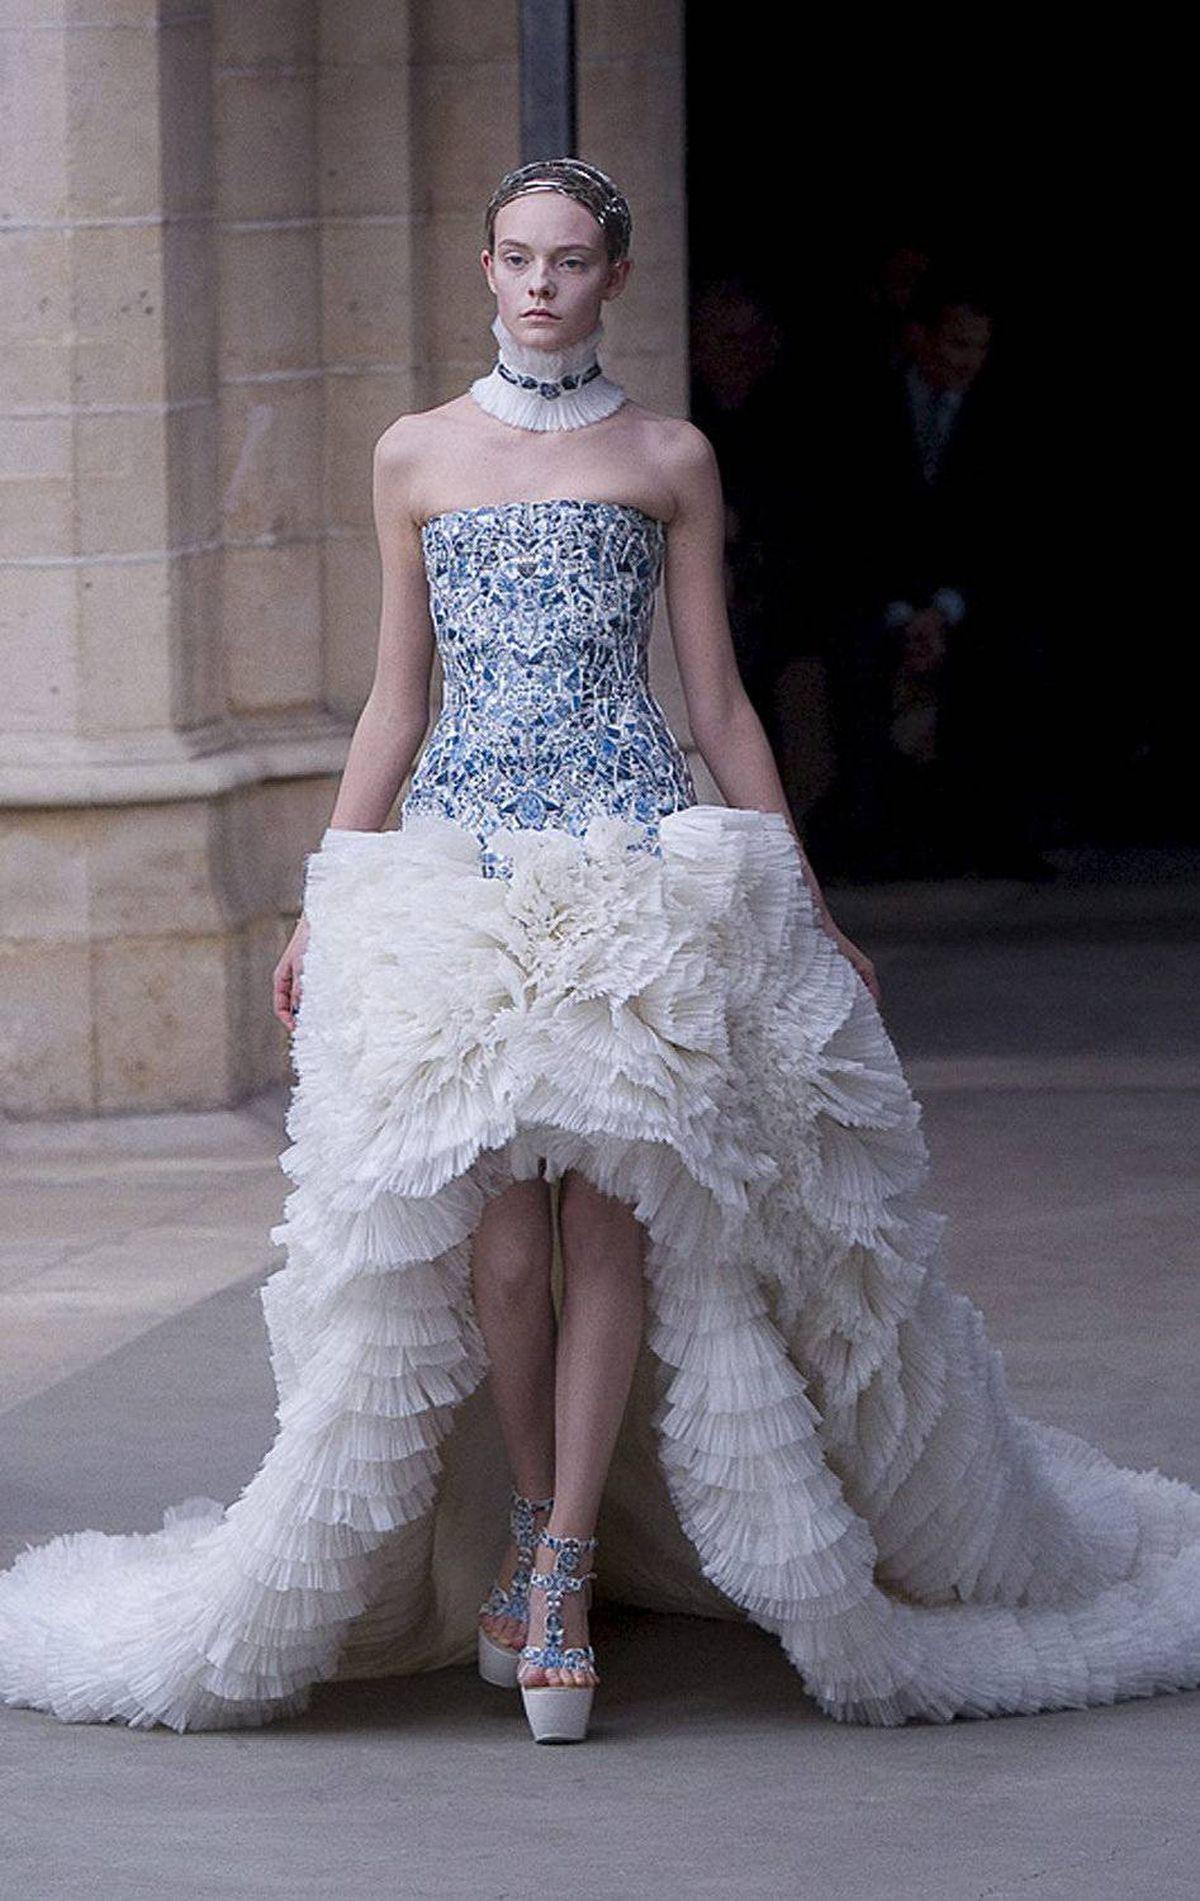 Imagine if Kate had worn this Alexander McQueen design on her wedding day?